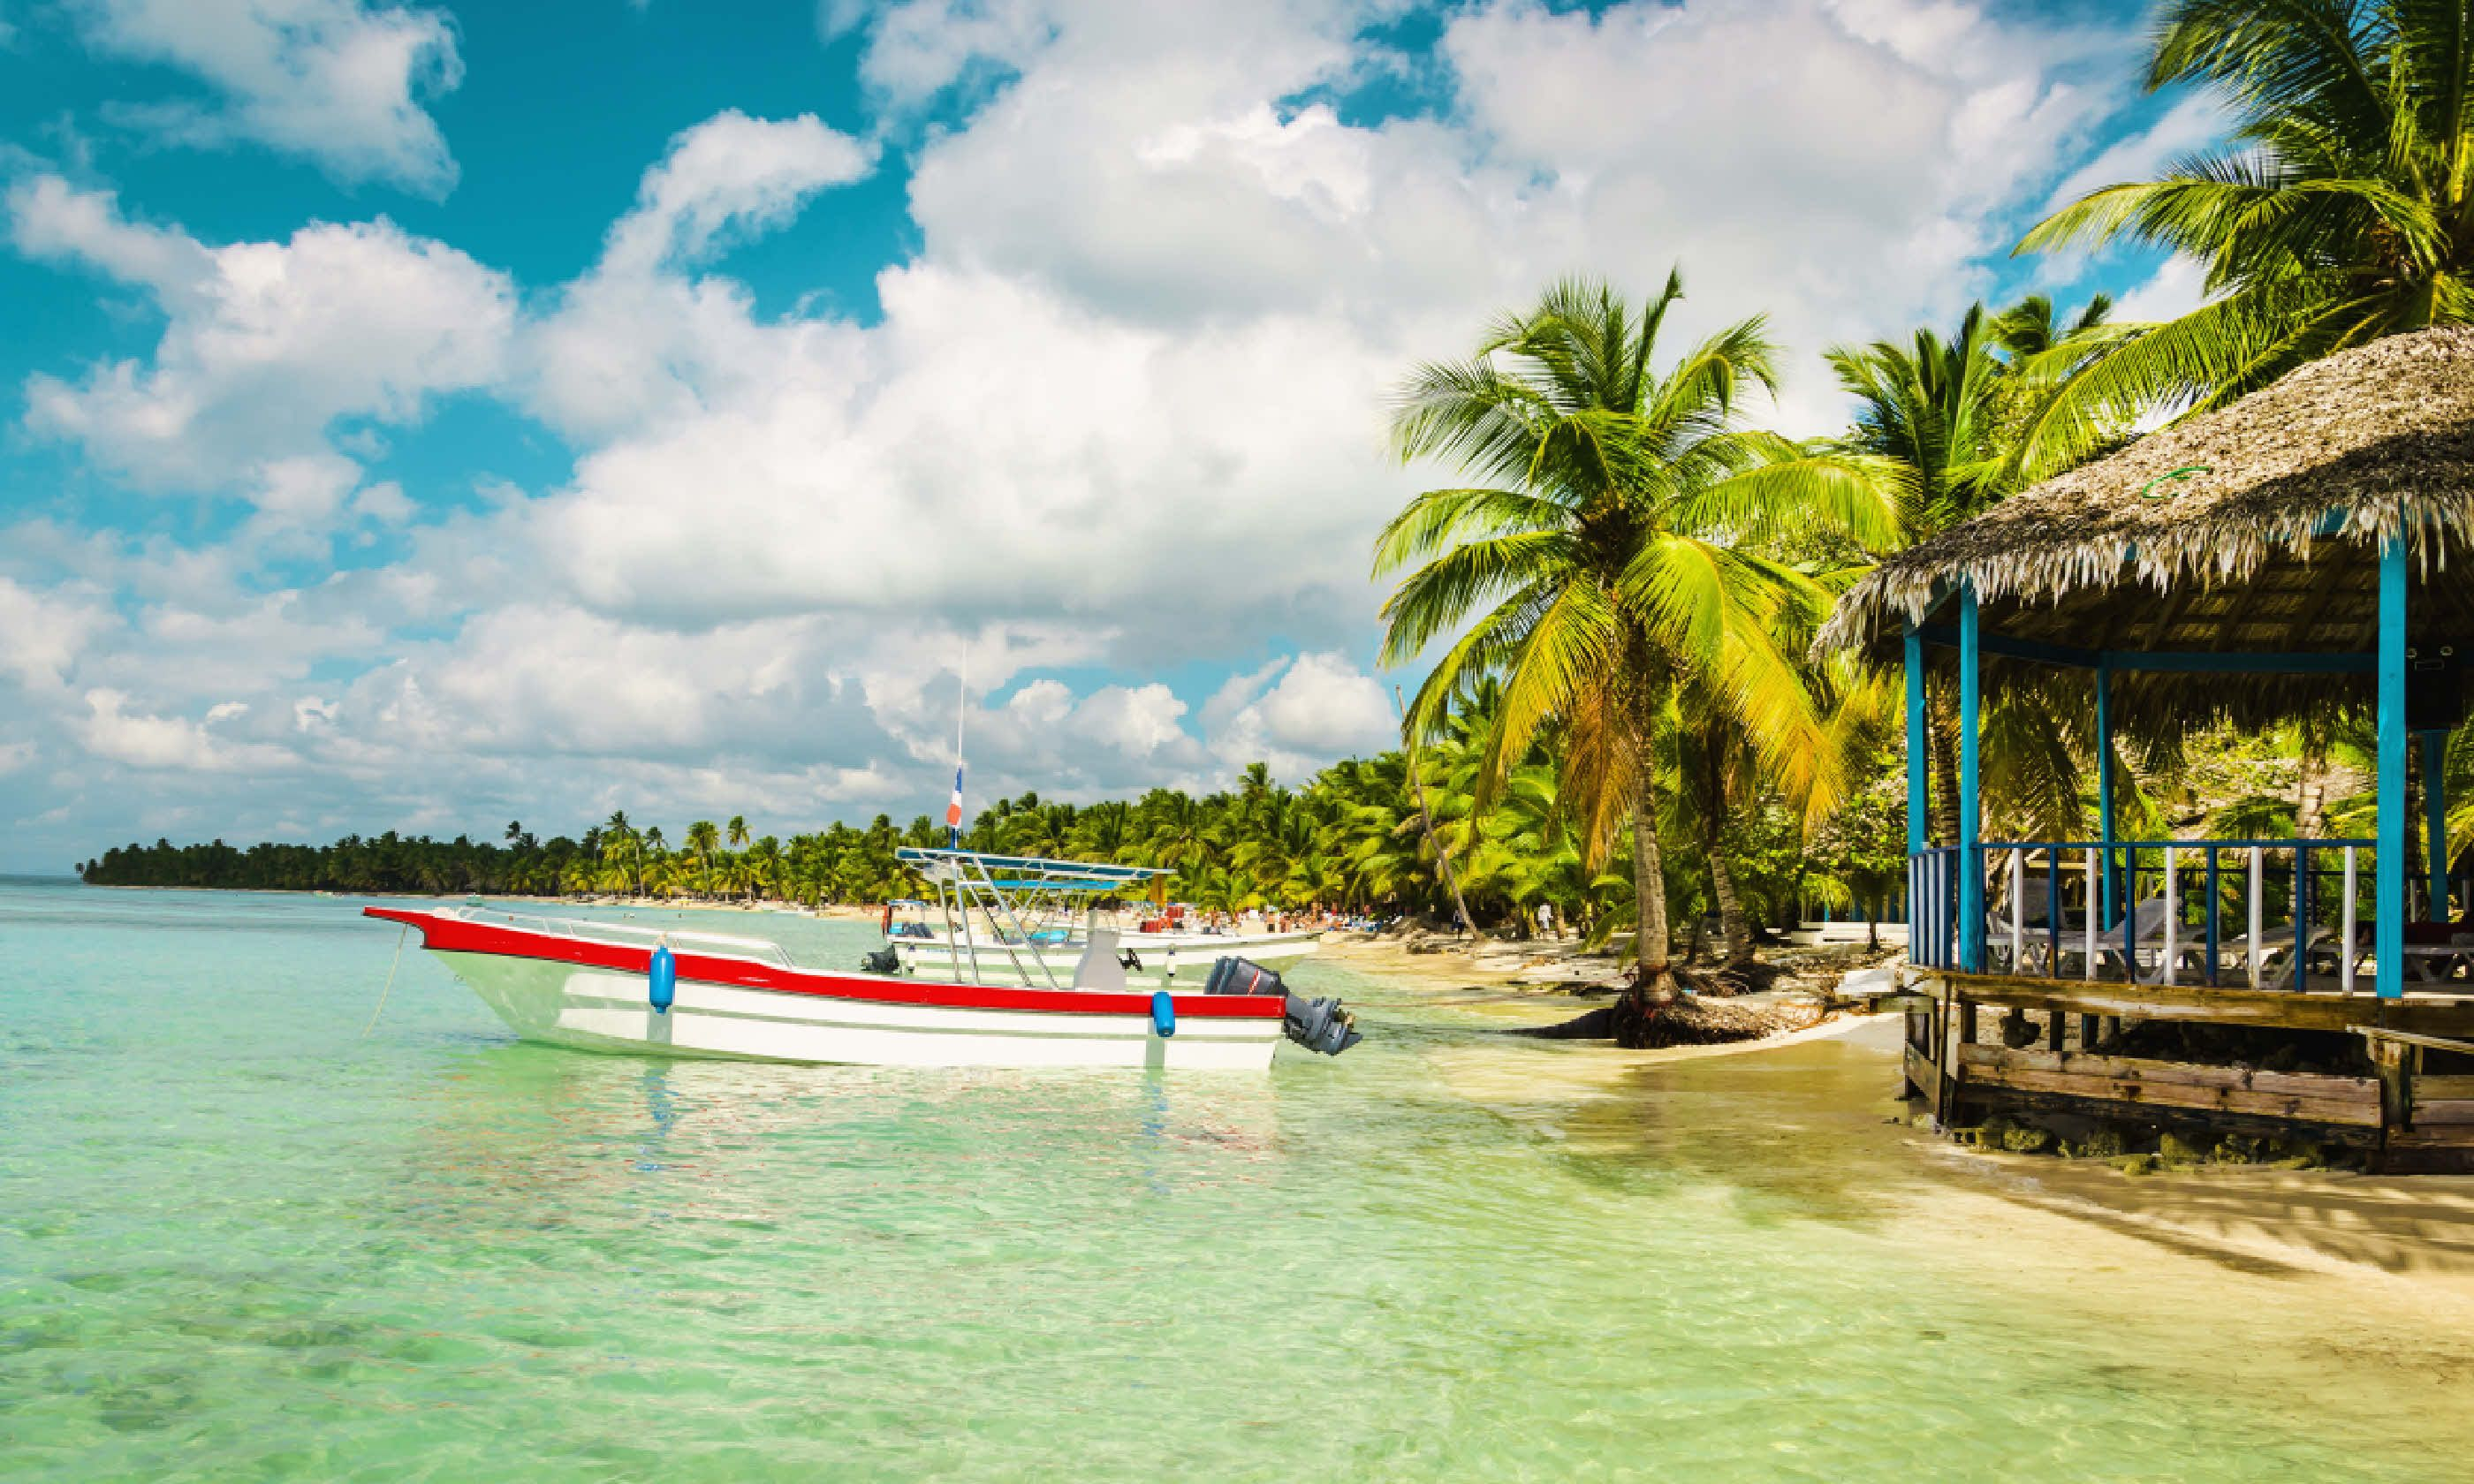 Boat in Haiti (Shutterstock)